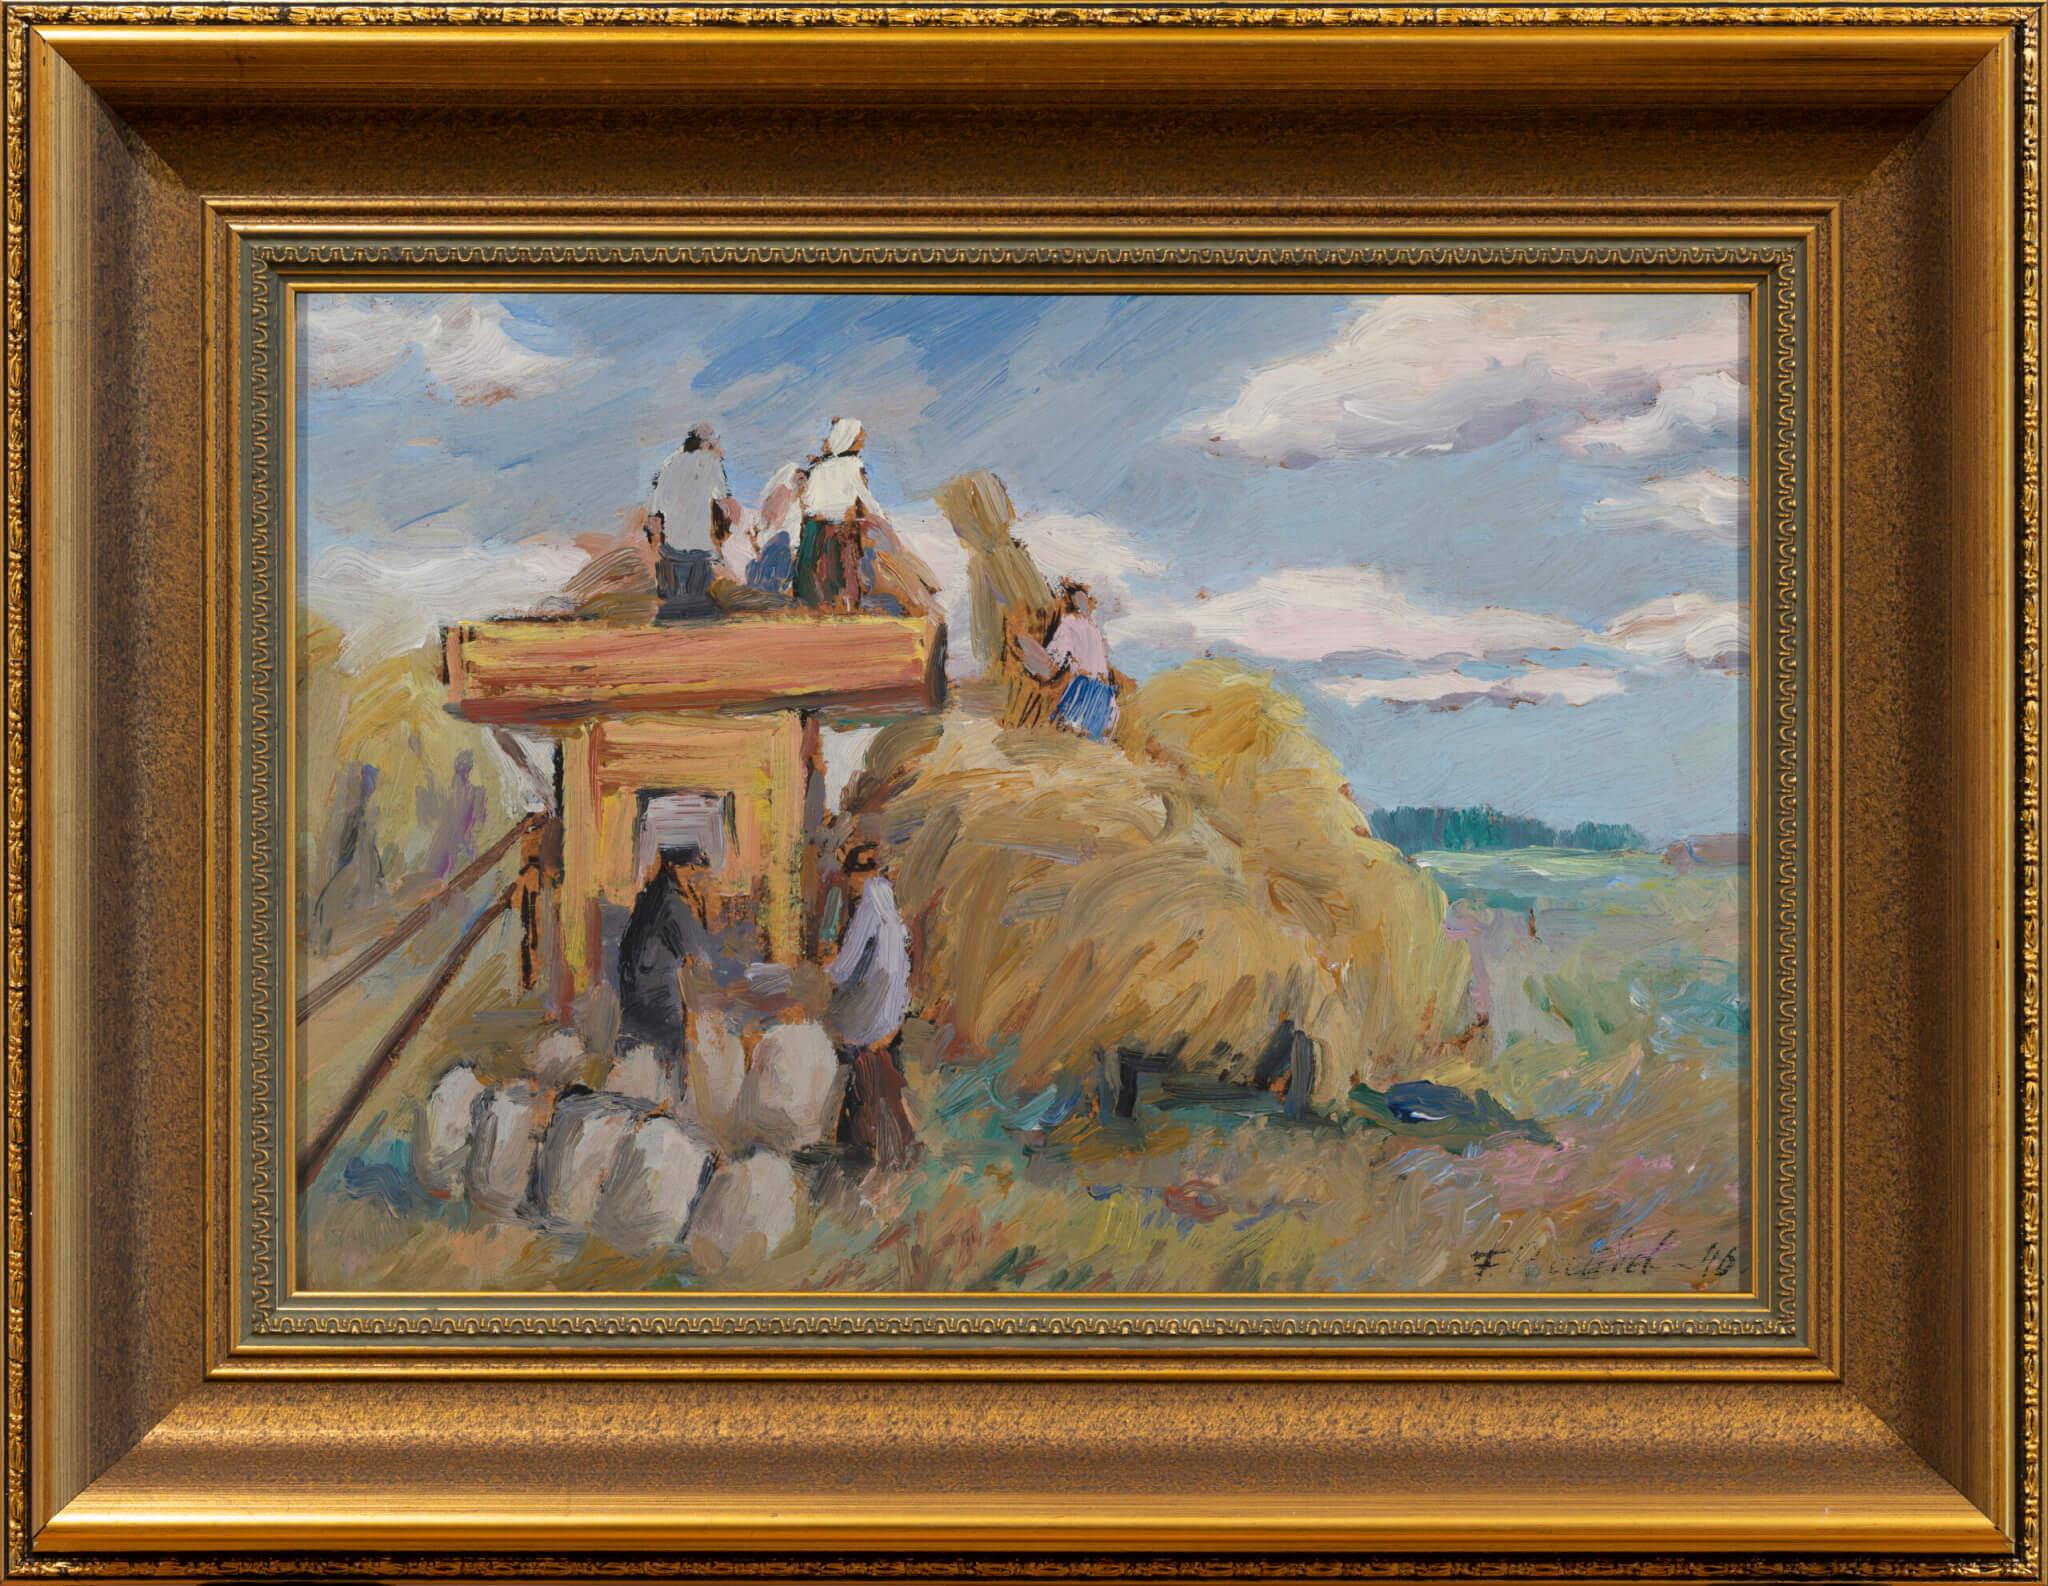 Felix-Randel-Heinategu-Allee-galerii